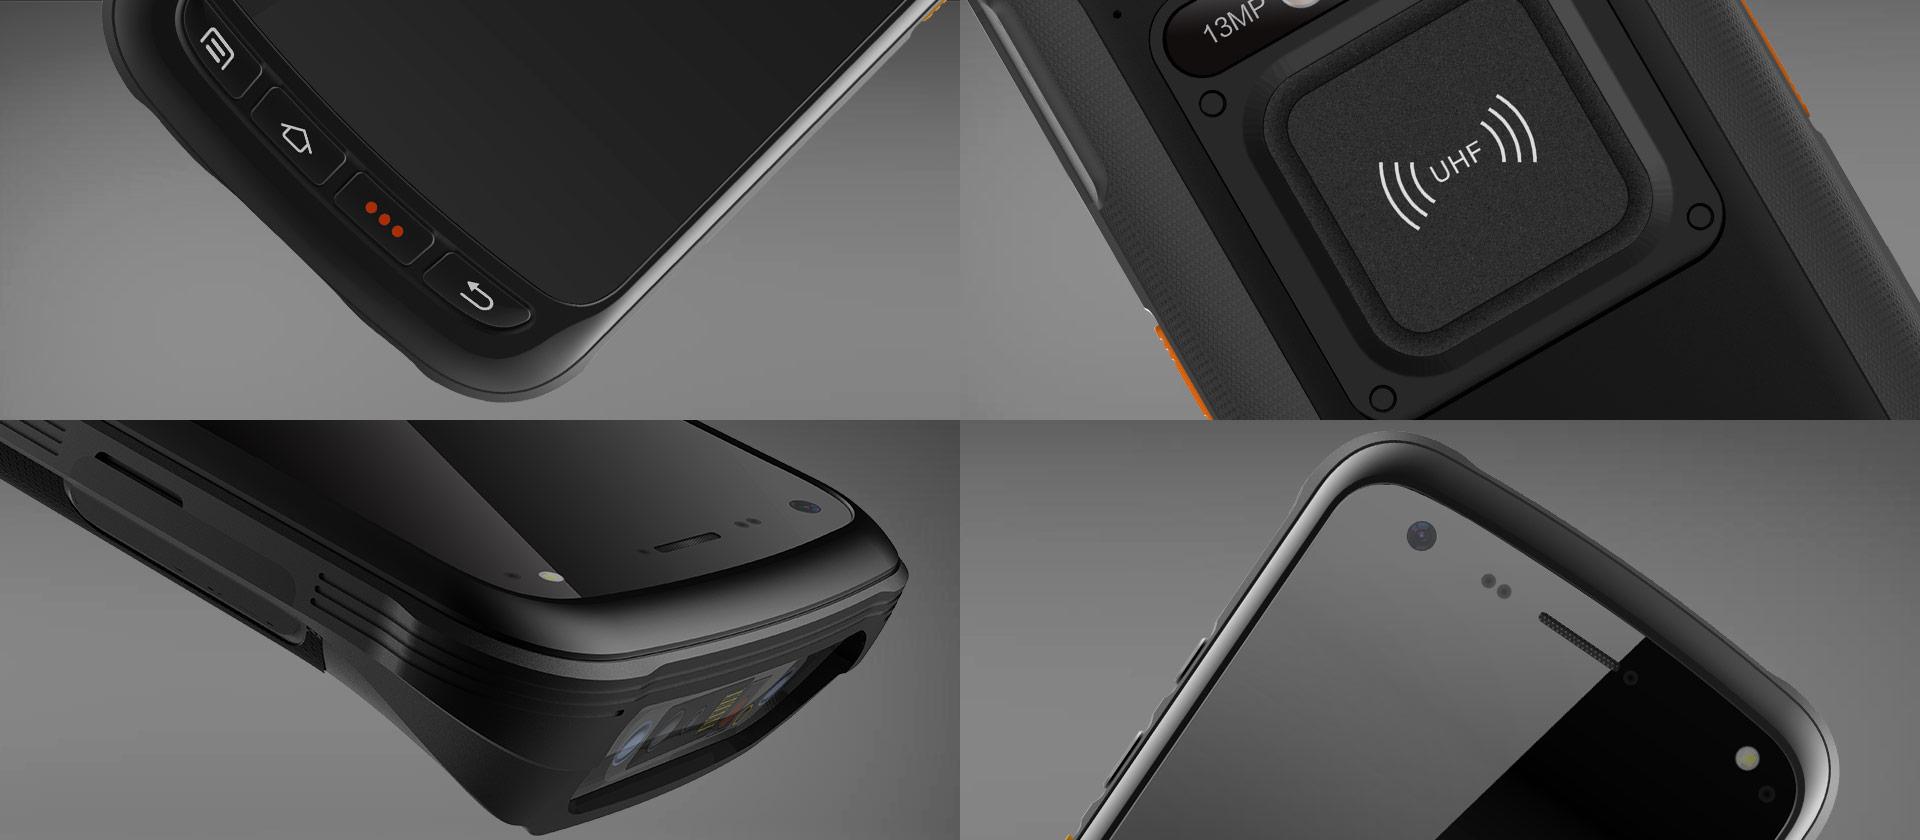 C71 - Android Industrial Mobile Computer RFID UHF - dettagli